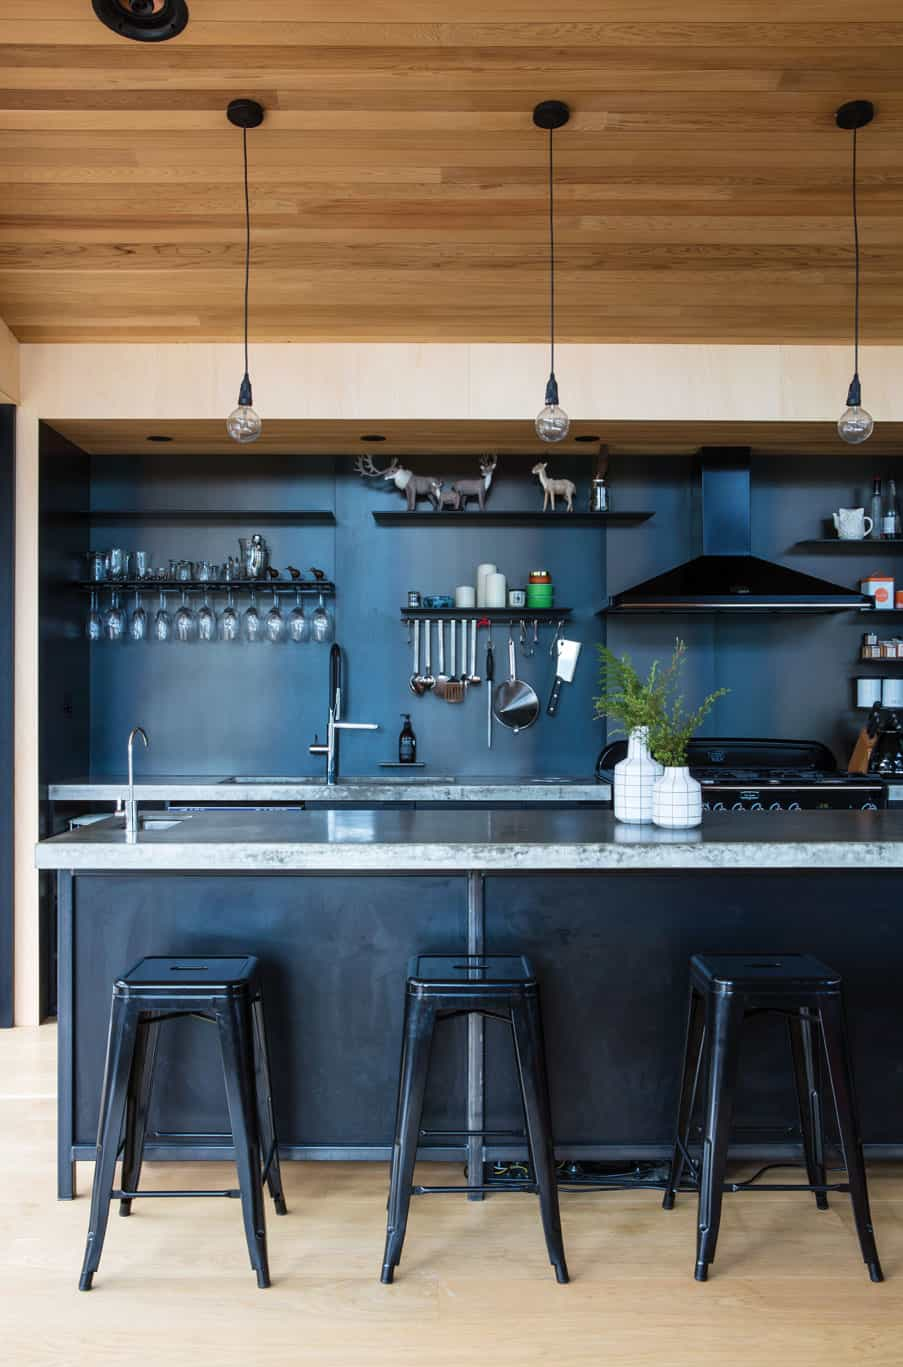 homestyle kitchen island - 28 images - homestyle kitchen island ...